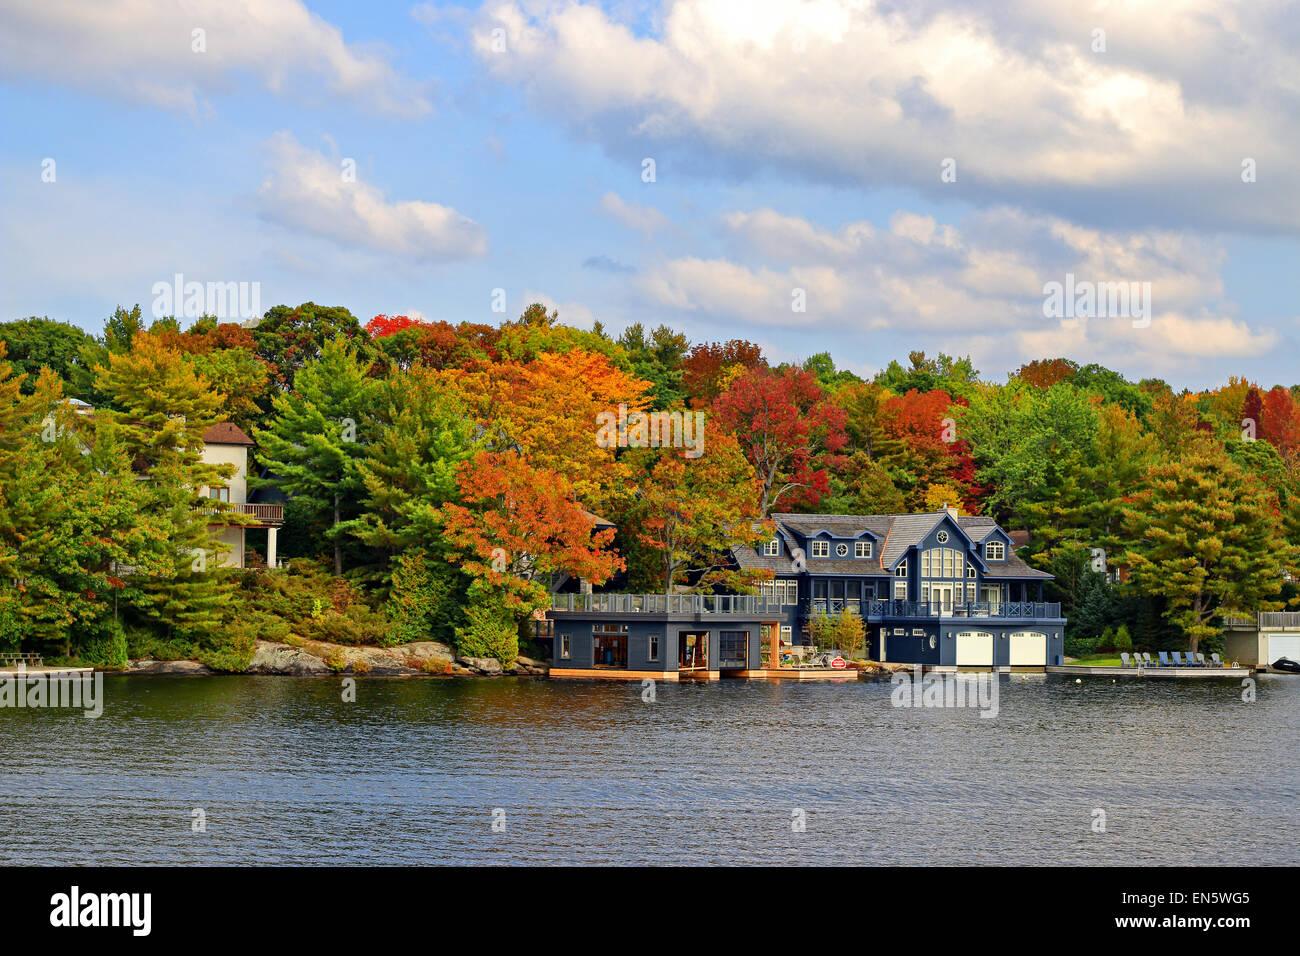 Million dollar cottages along Lake Moskoka near Gravenhurst, Ontario, in autumn. Photographed on a boat in Lake - Stock Image